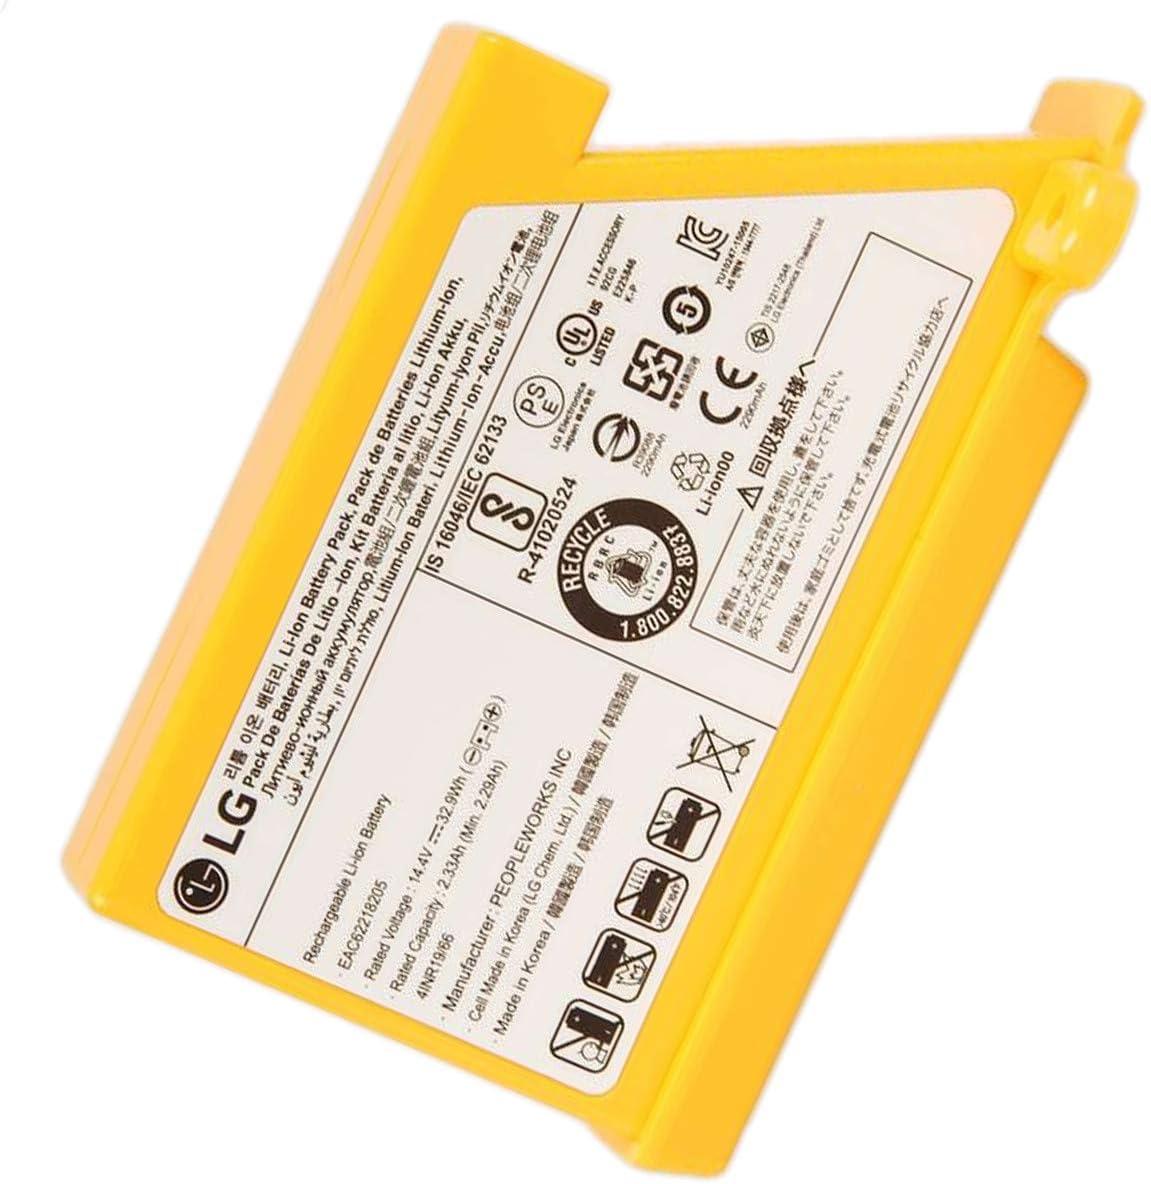 Batería para aspirador robot EAC62218205 LG: Amazon.es: Grandes ...